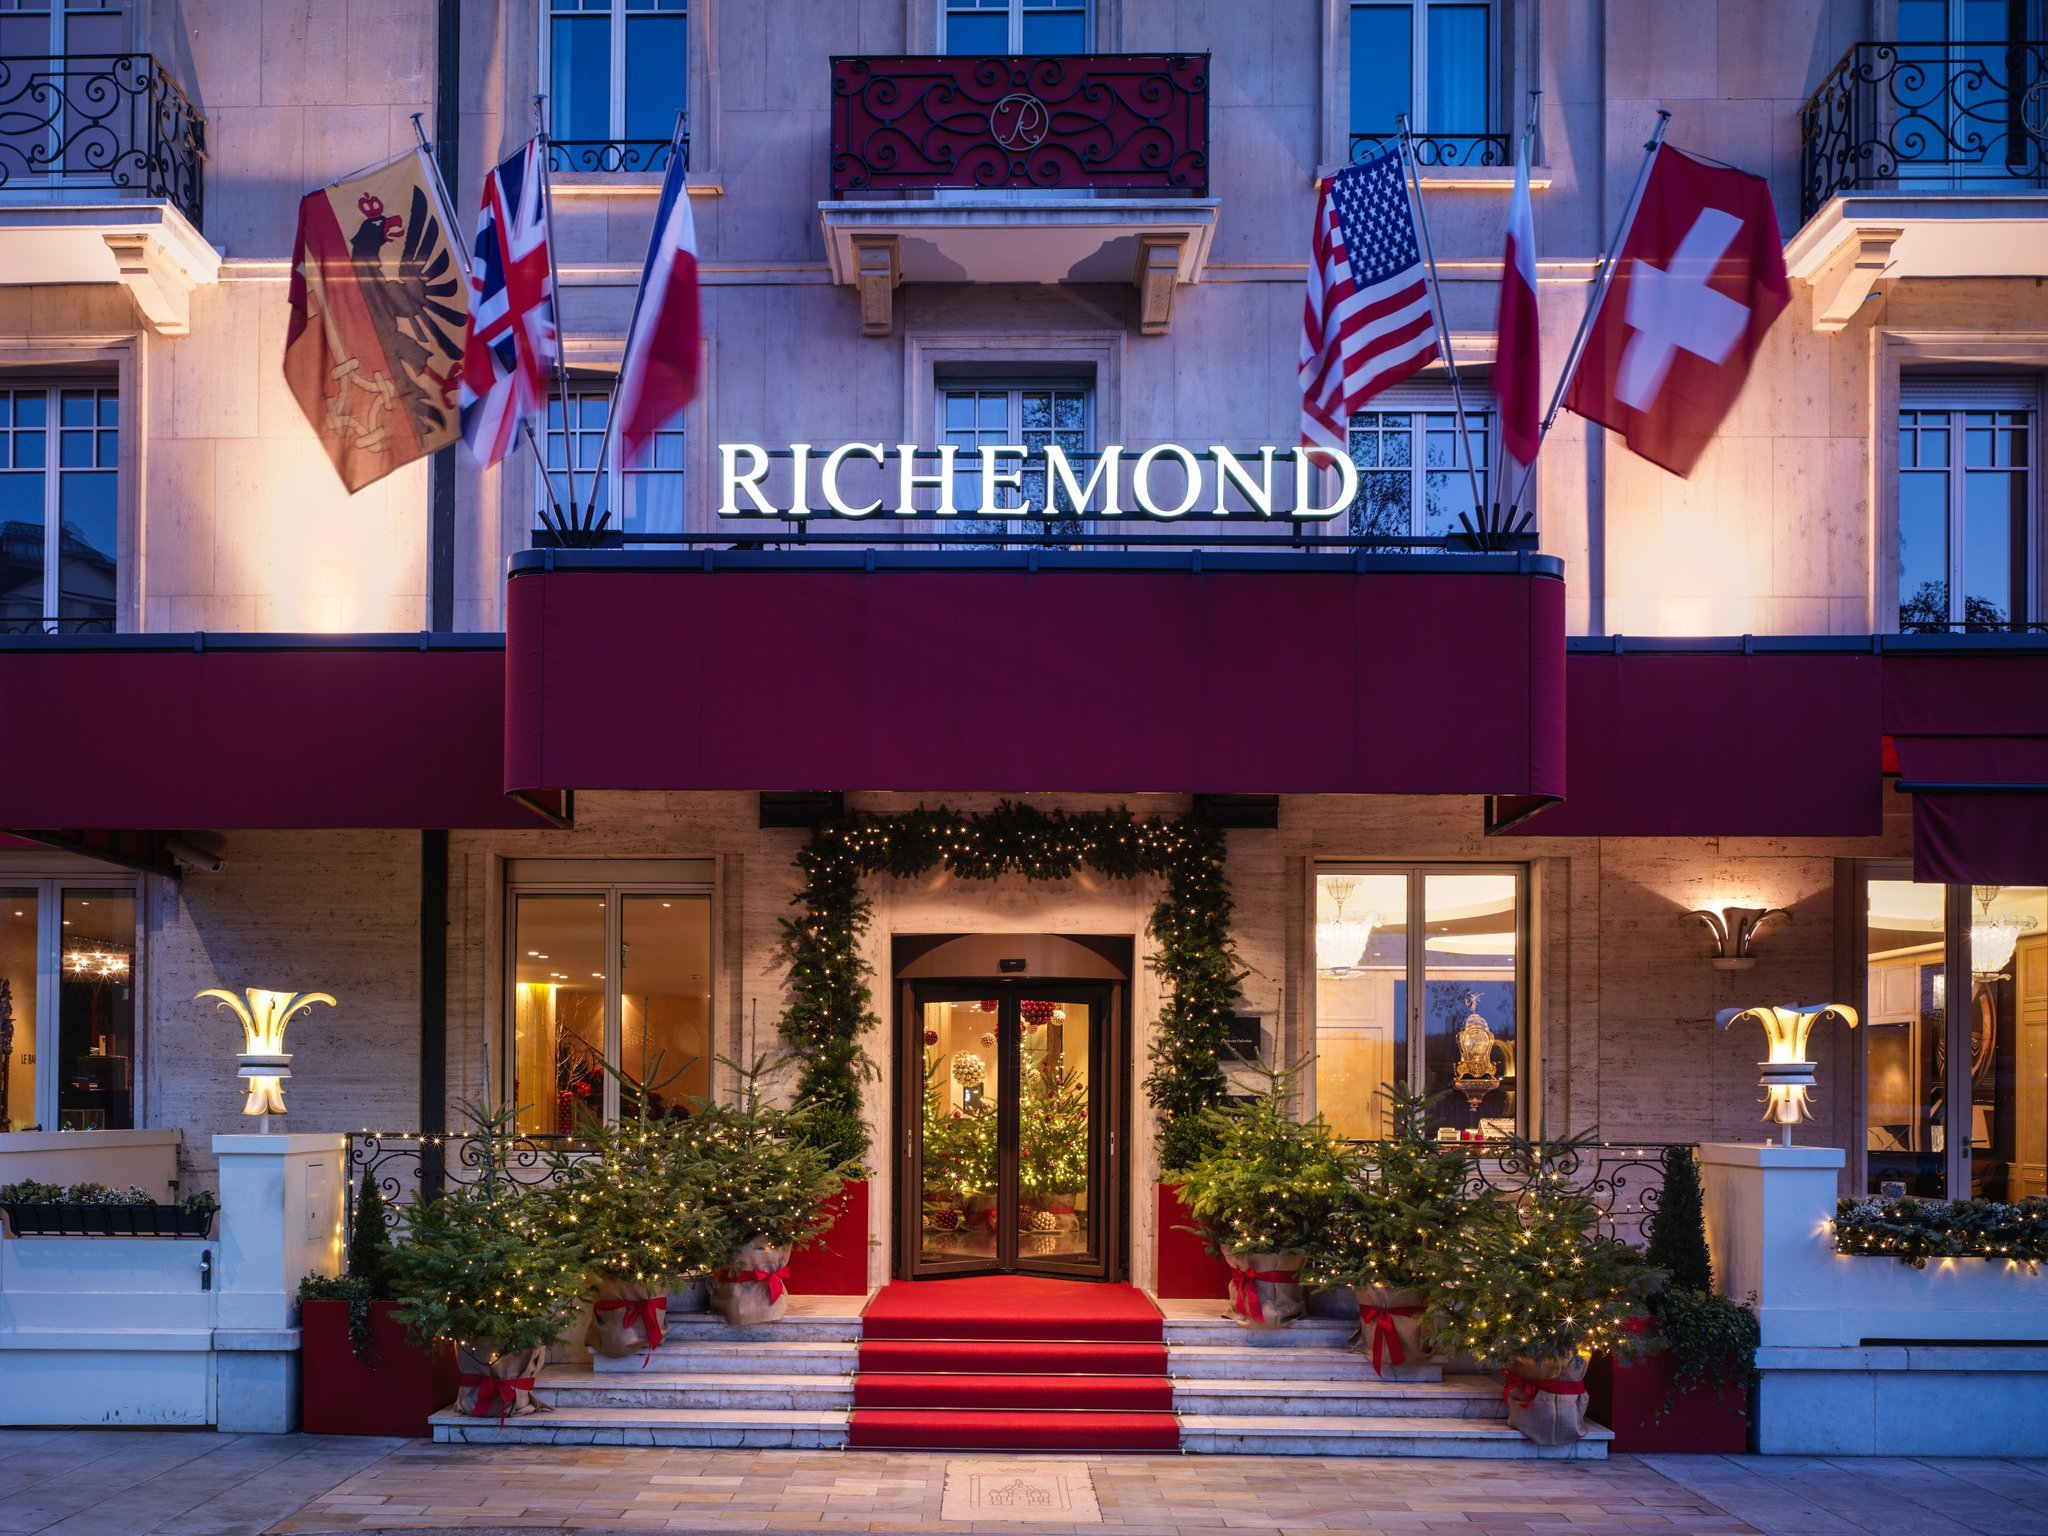 Le Richemond, Geneva Dorchester Collection